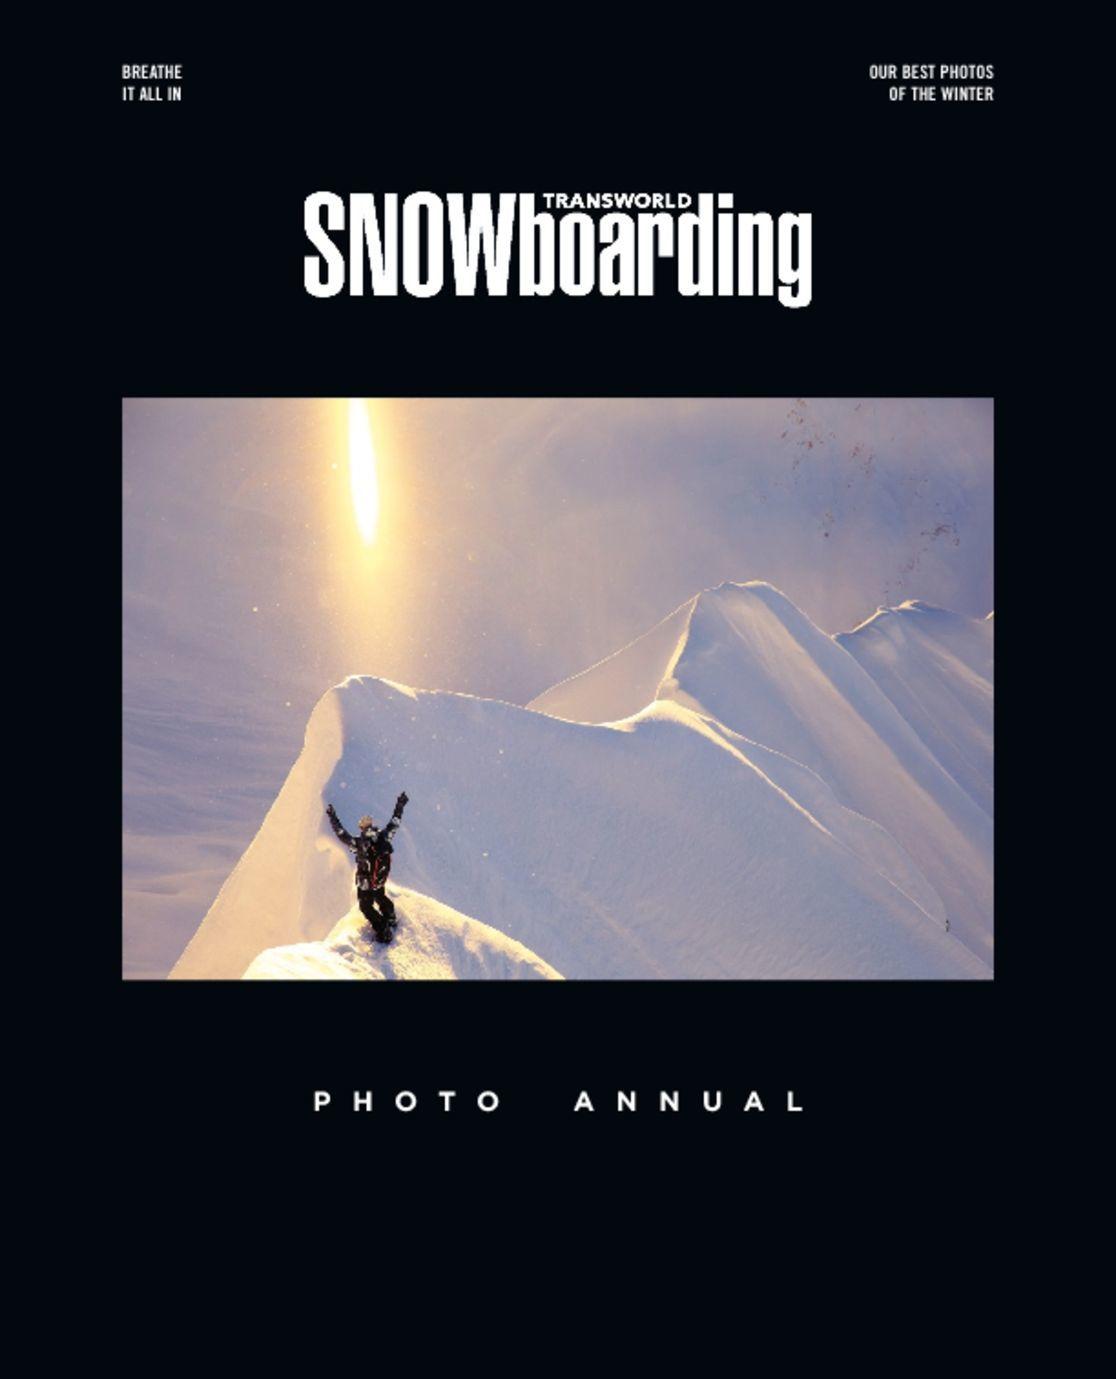 TransWorld SNOWboarding Photo Annual Digital